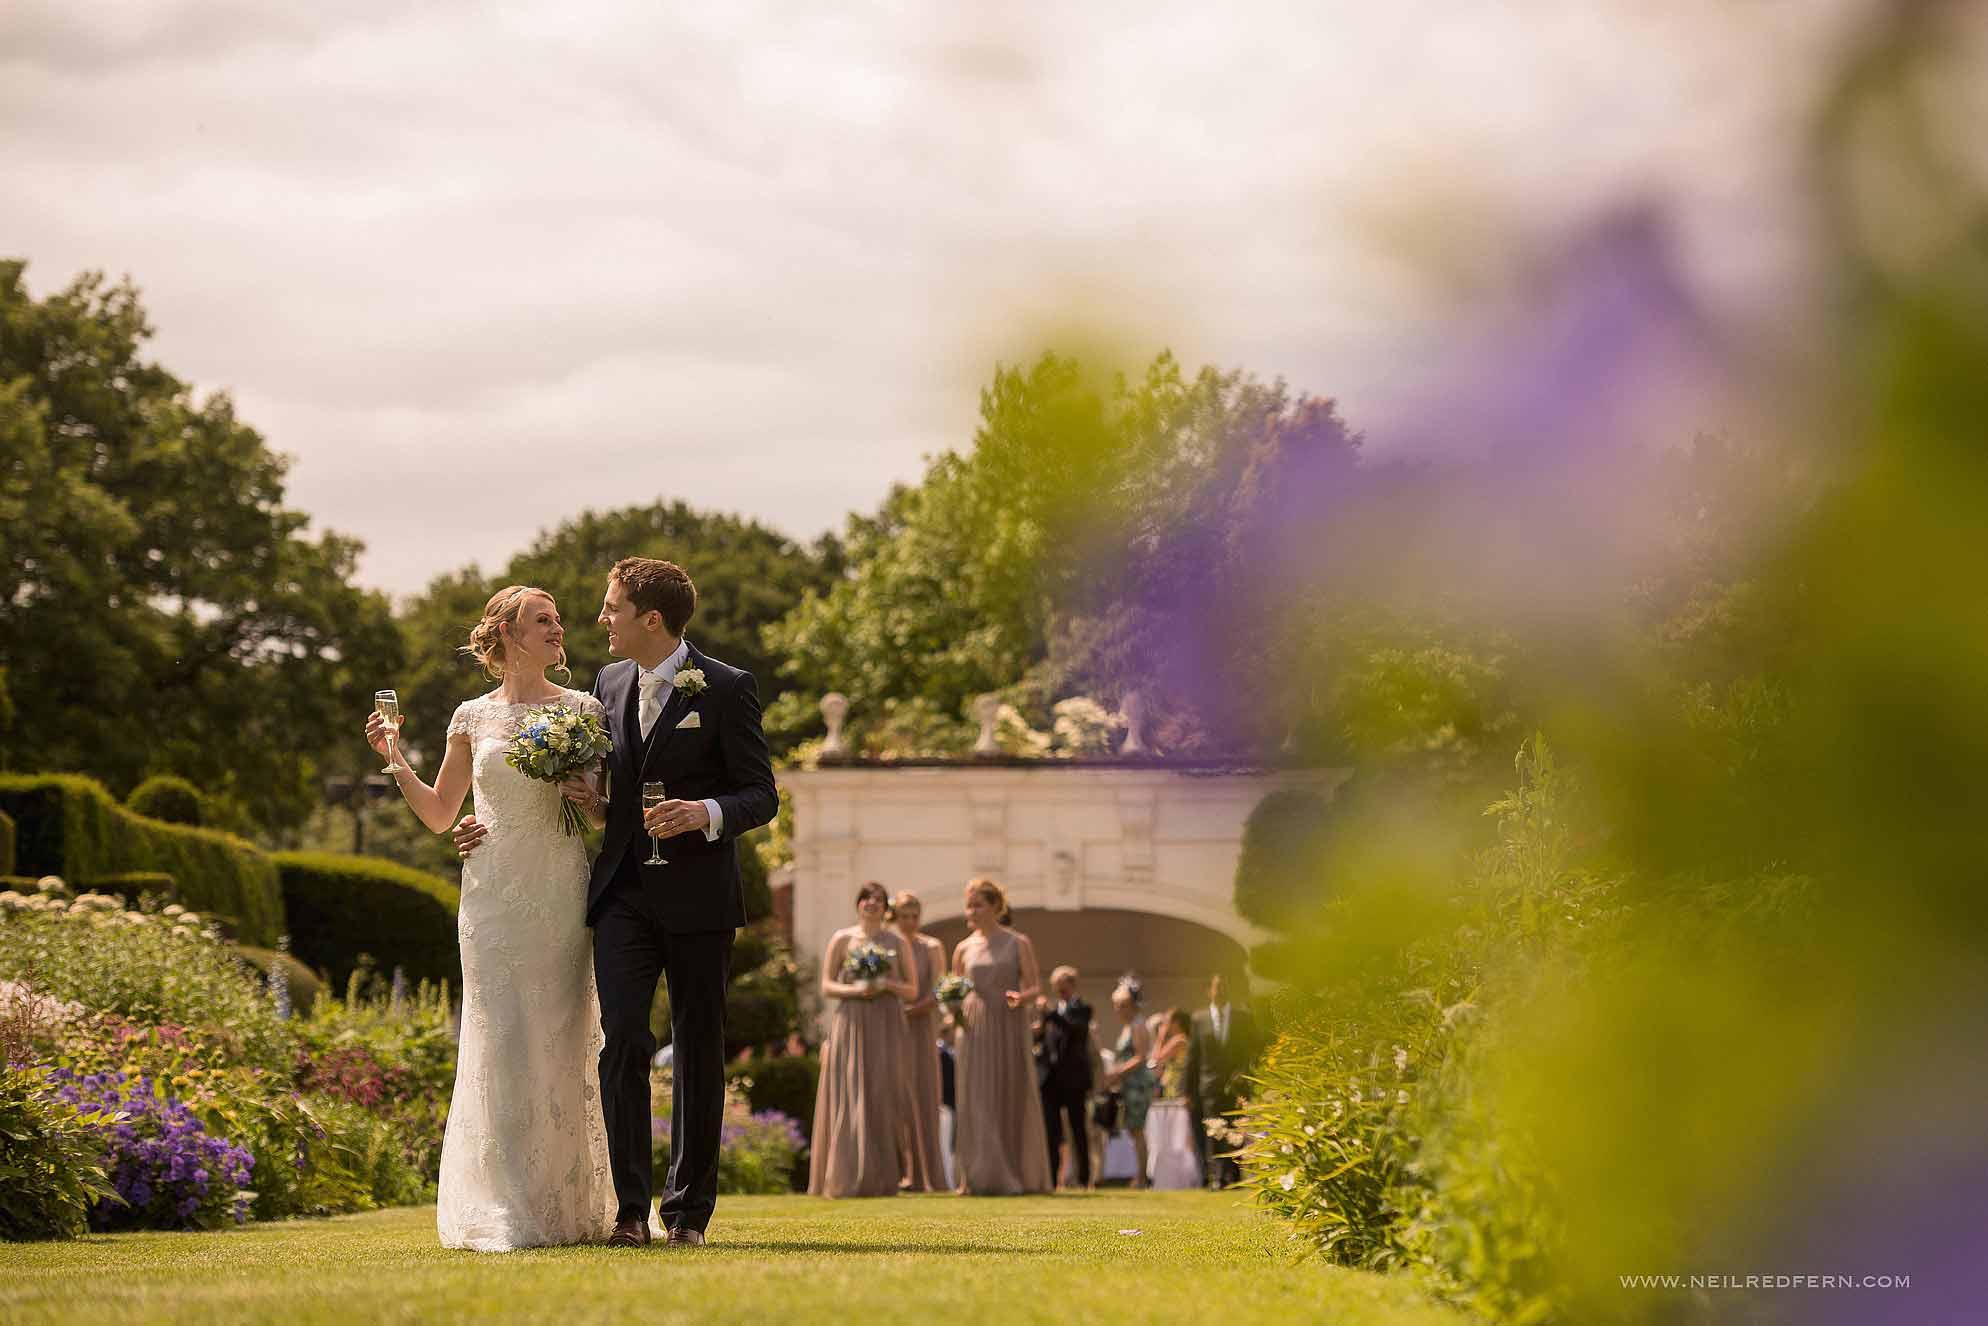 outdoor-wedding-ceremony-in-cheshire-8